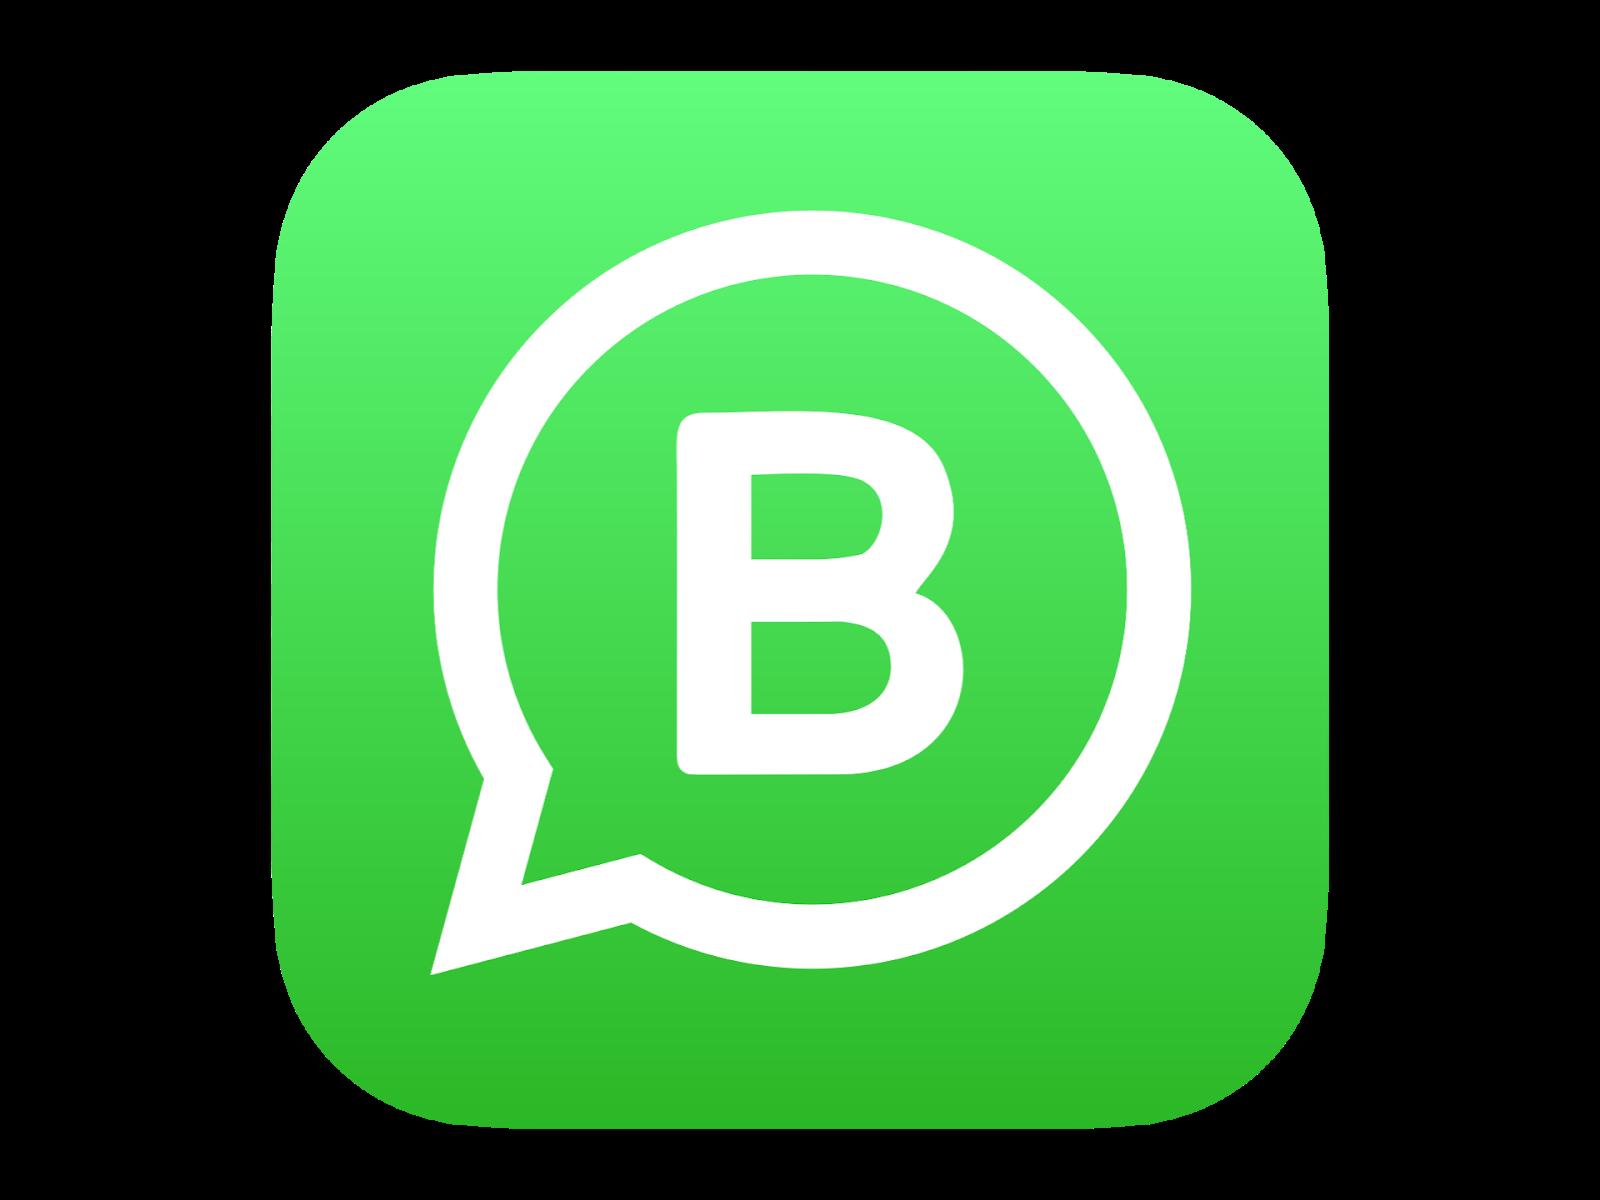 Logo Whatsapp Business Format PNG